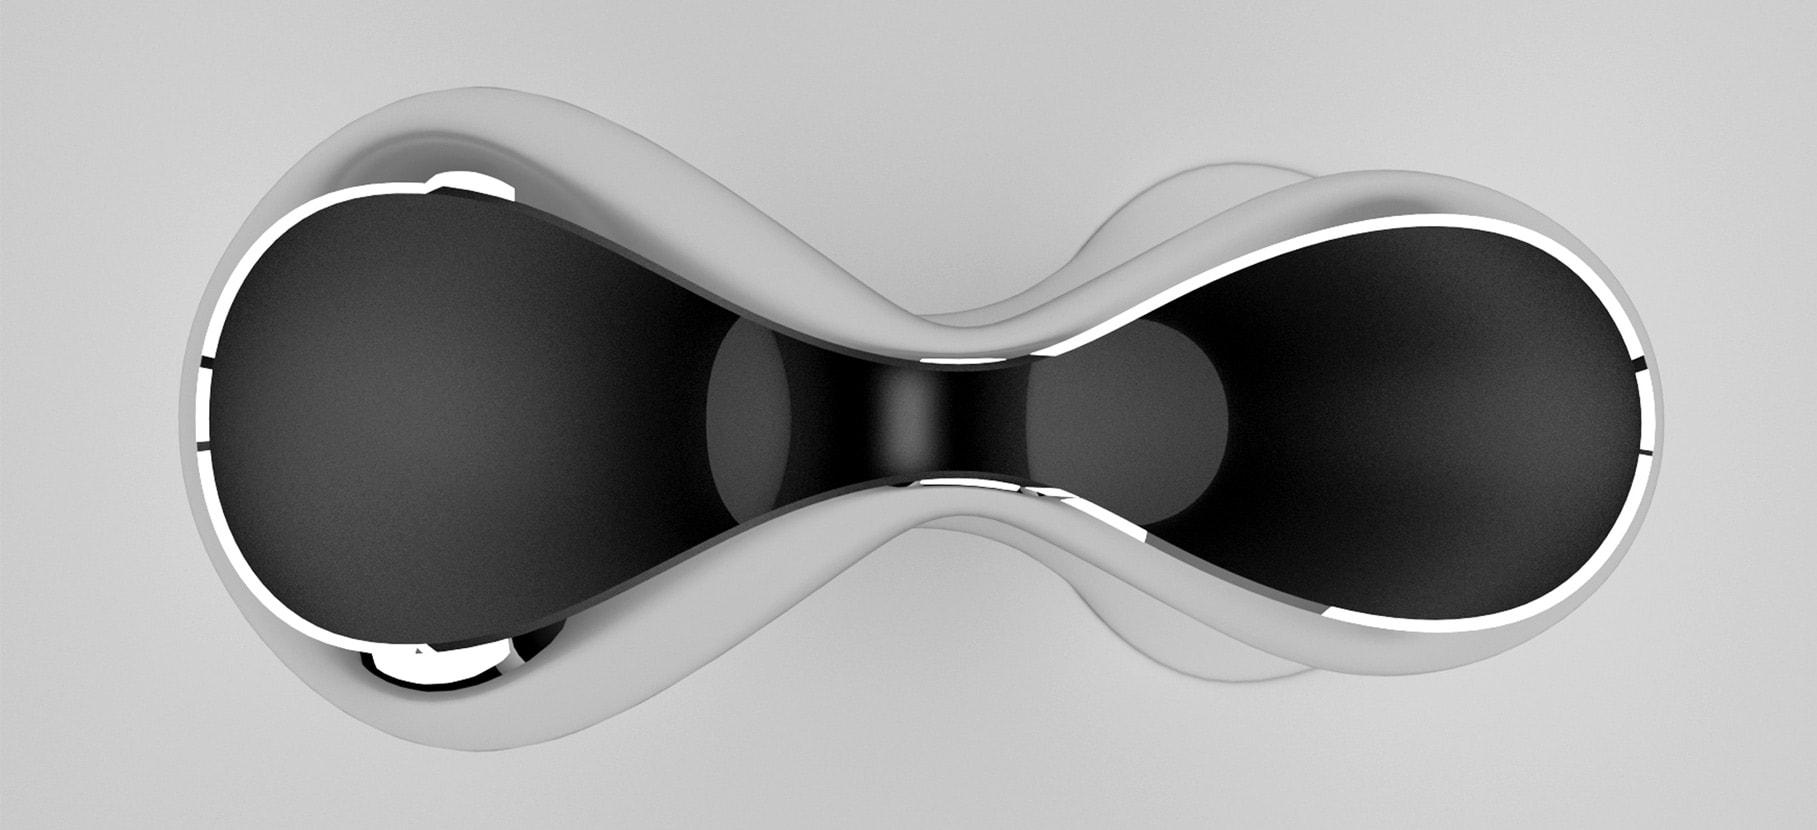 Amphora_Vase_4